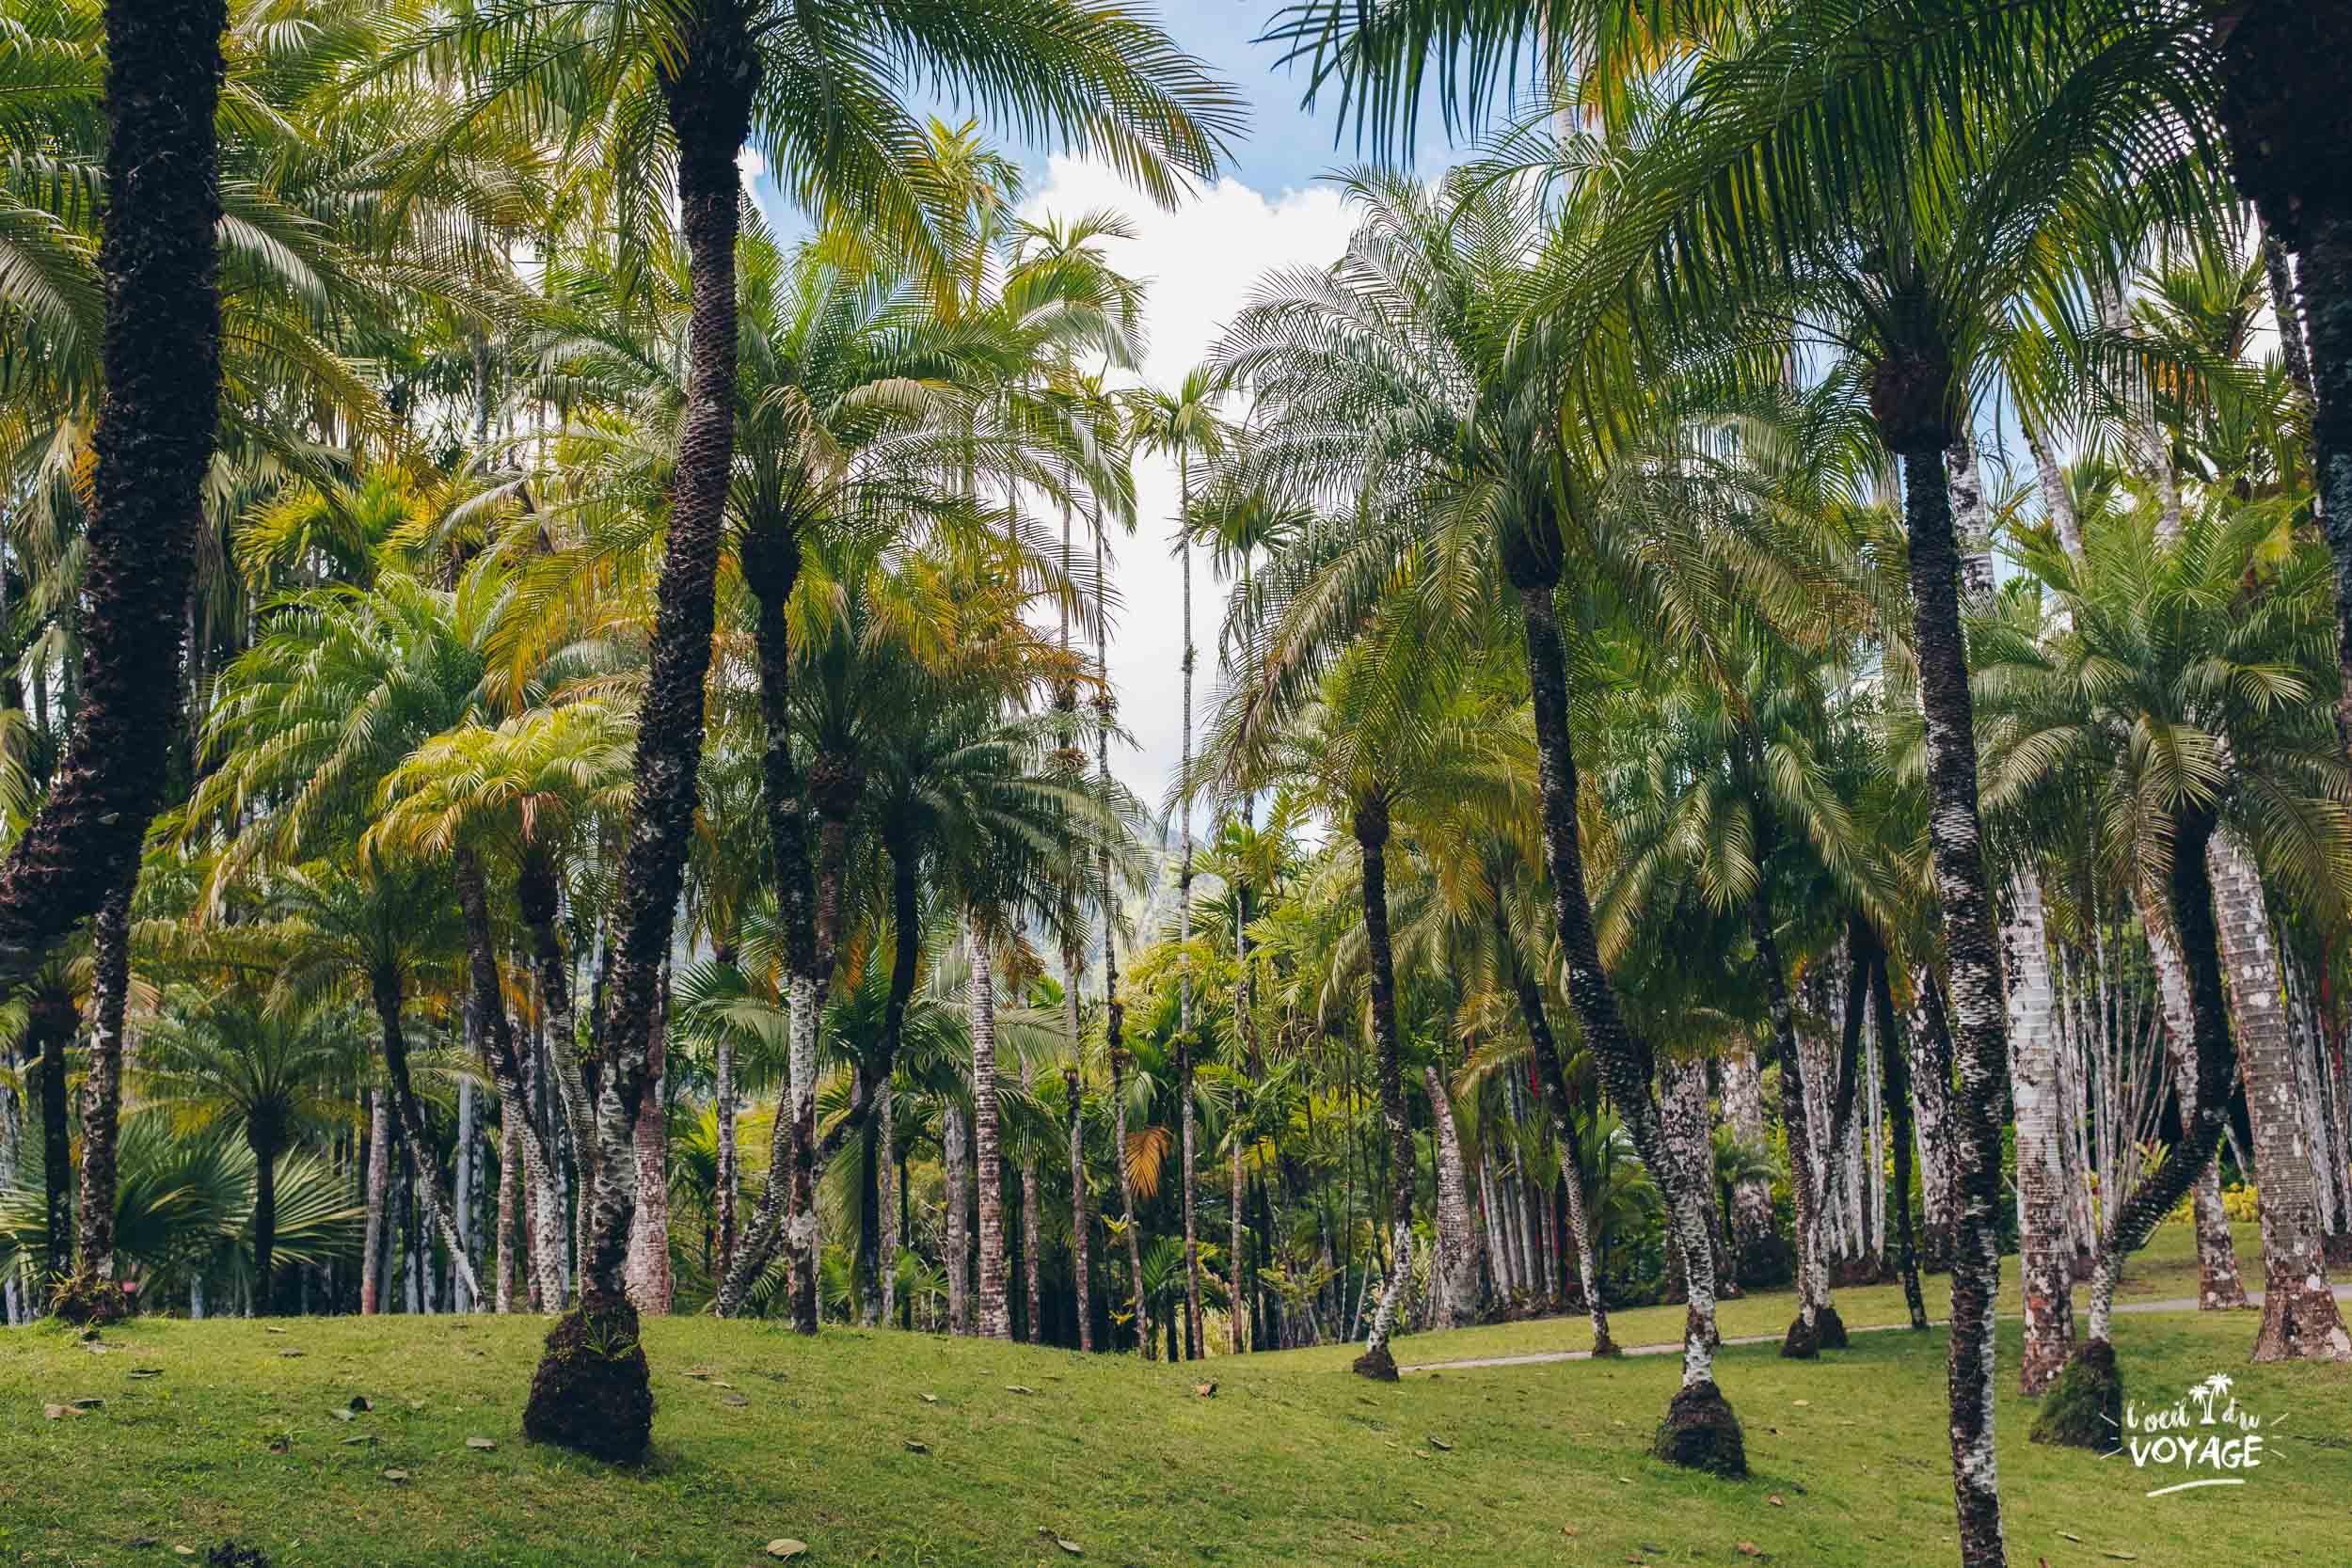 voyage antillais, jardin de balata, meilleur blog voyage france